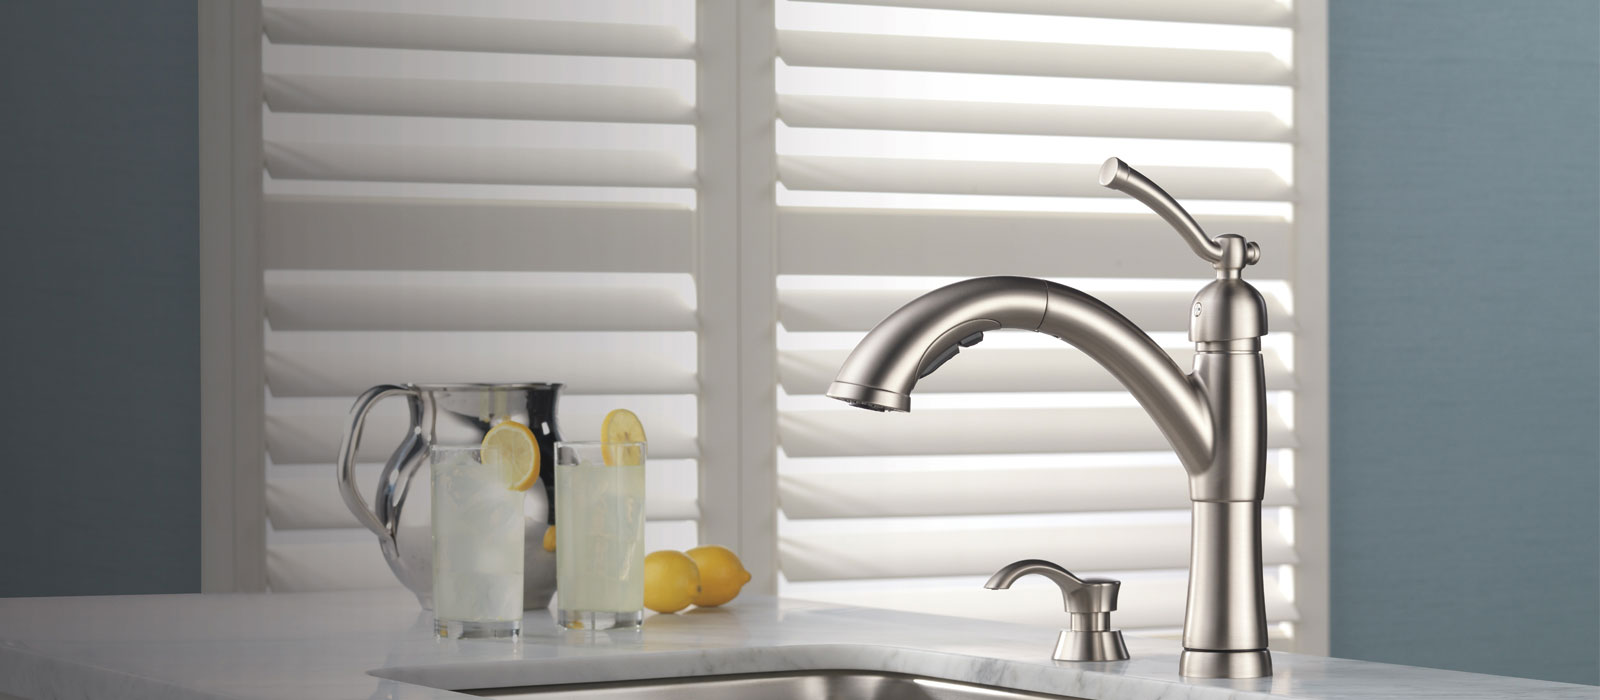 Valdosta Kitchen Collection Delta Faucet